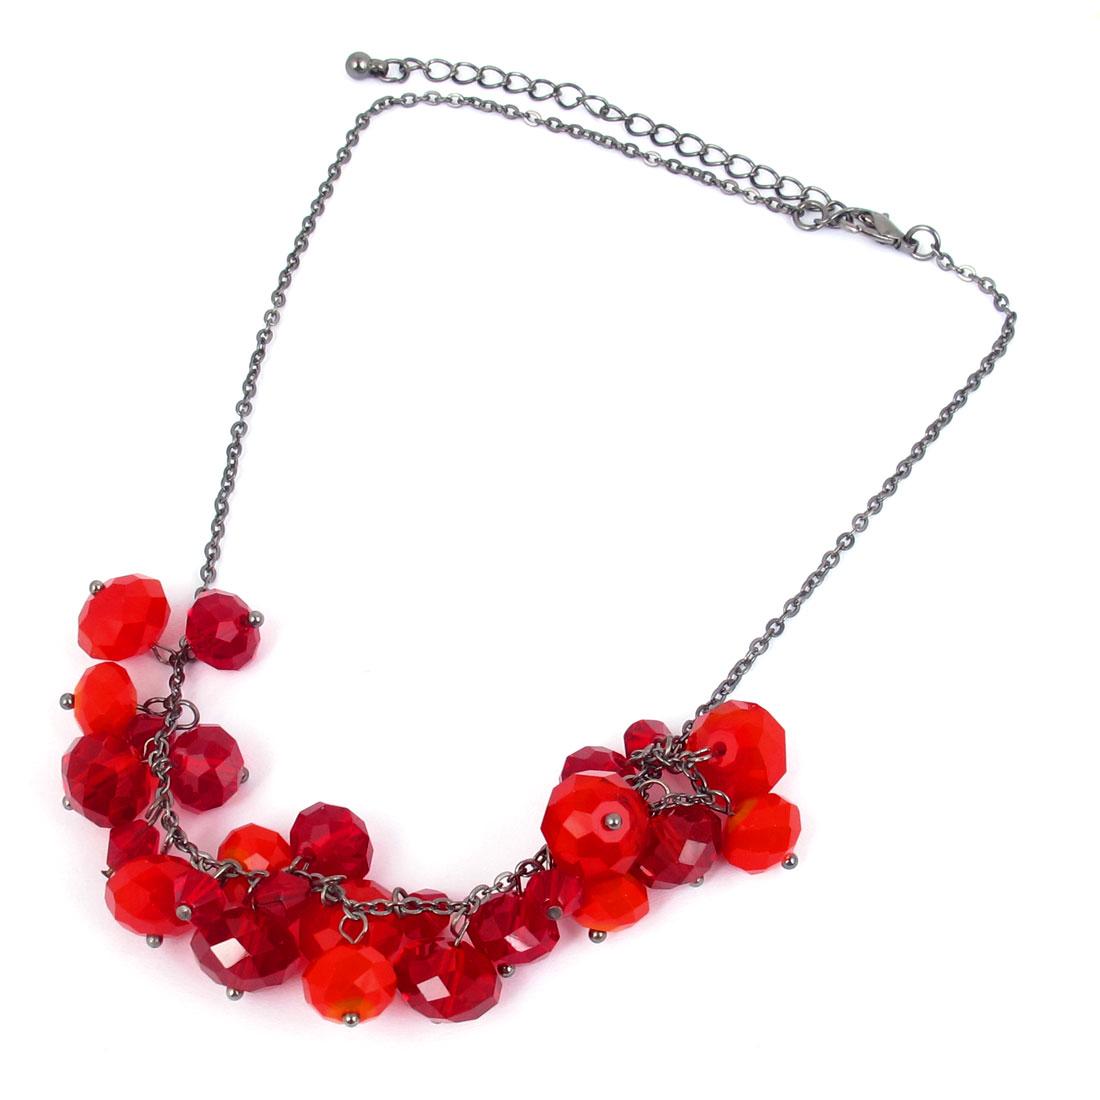 Ladies Red Plastic Beads Decor Black Metal Lobster Buckle Slim Chain Necklace w Fish Hook Earrings